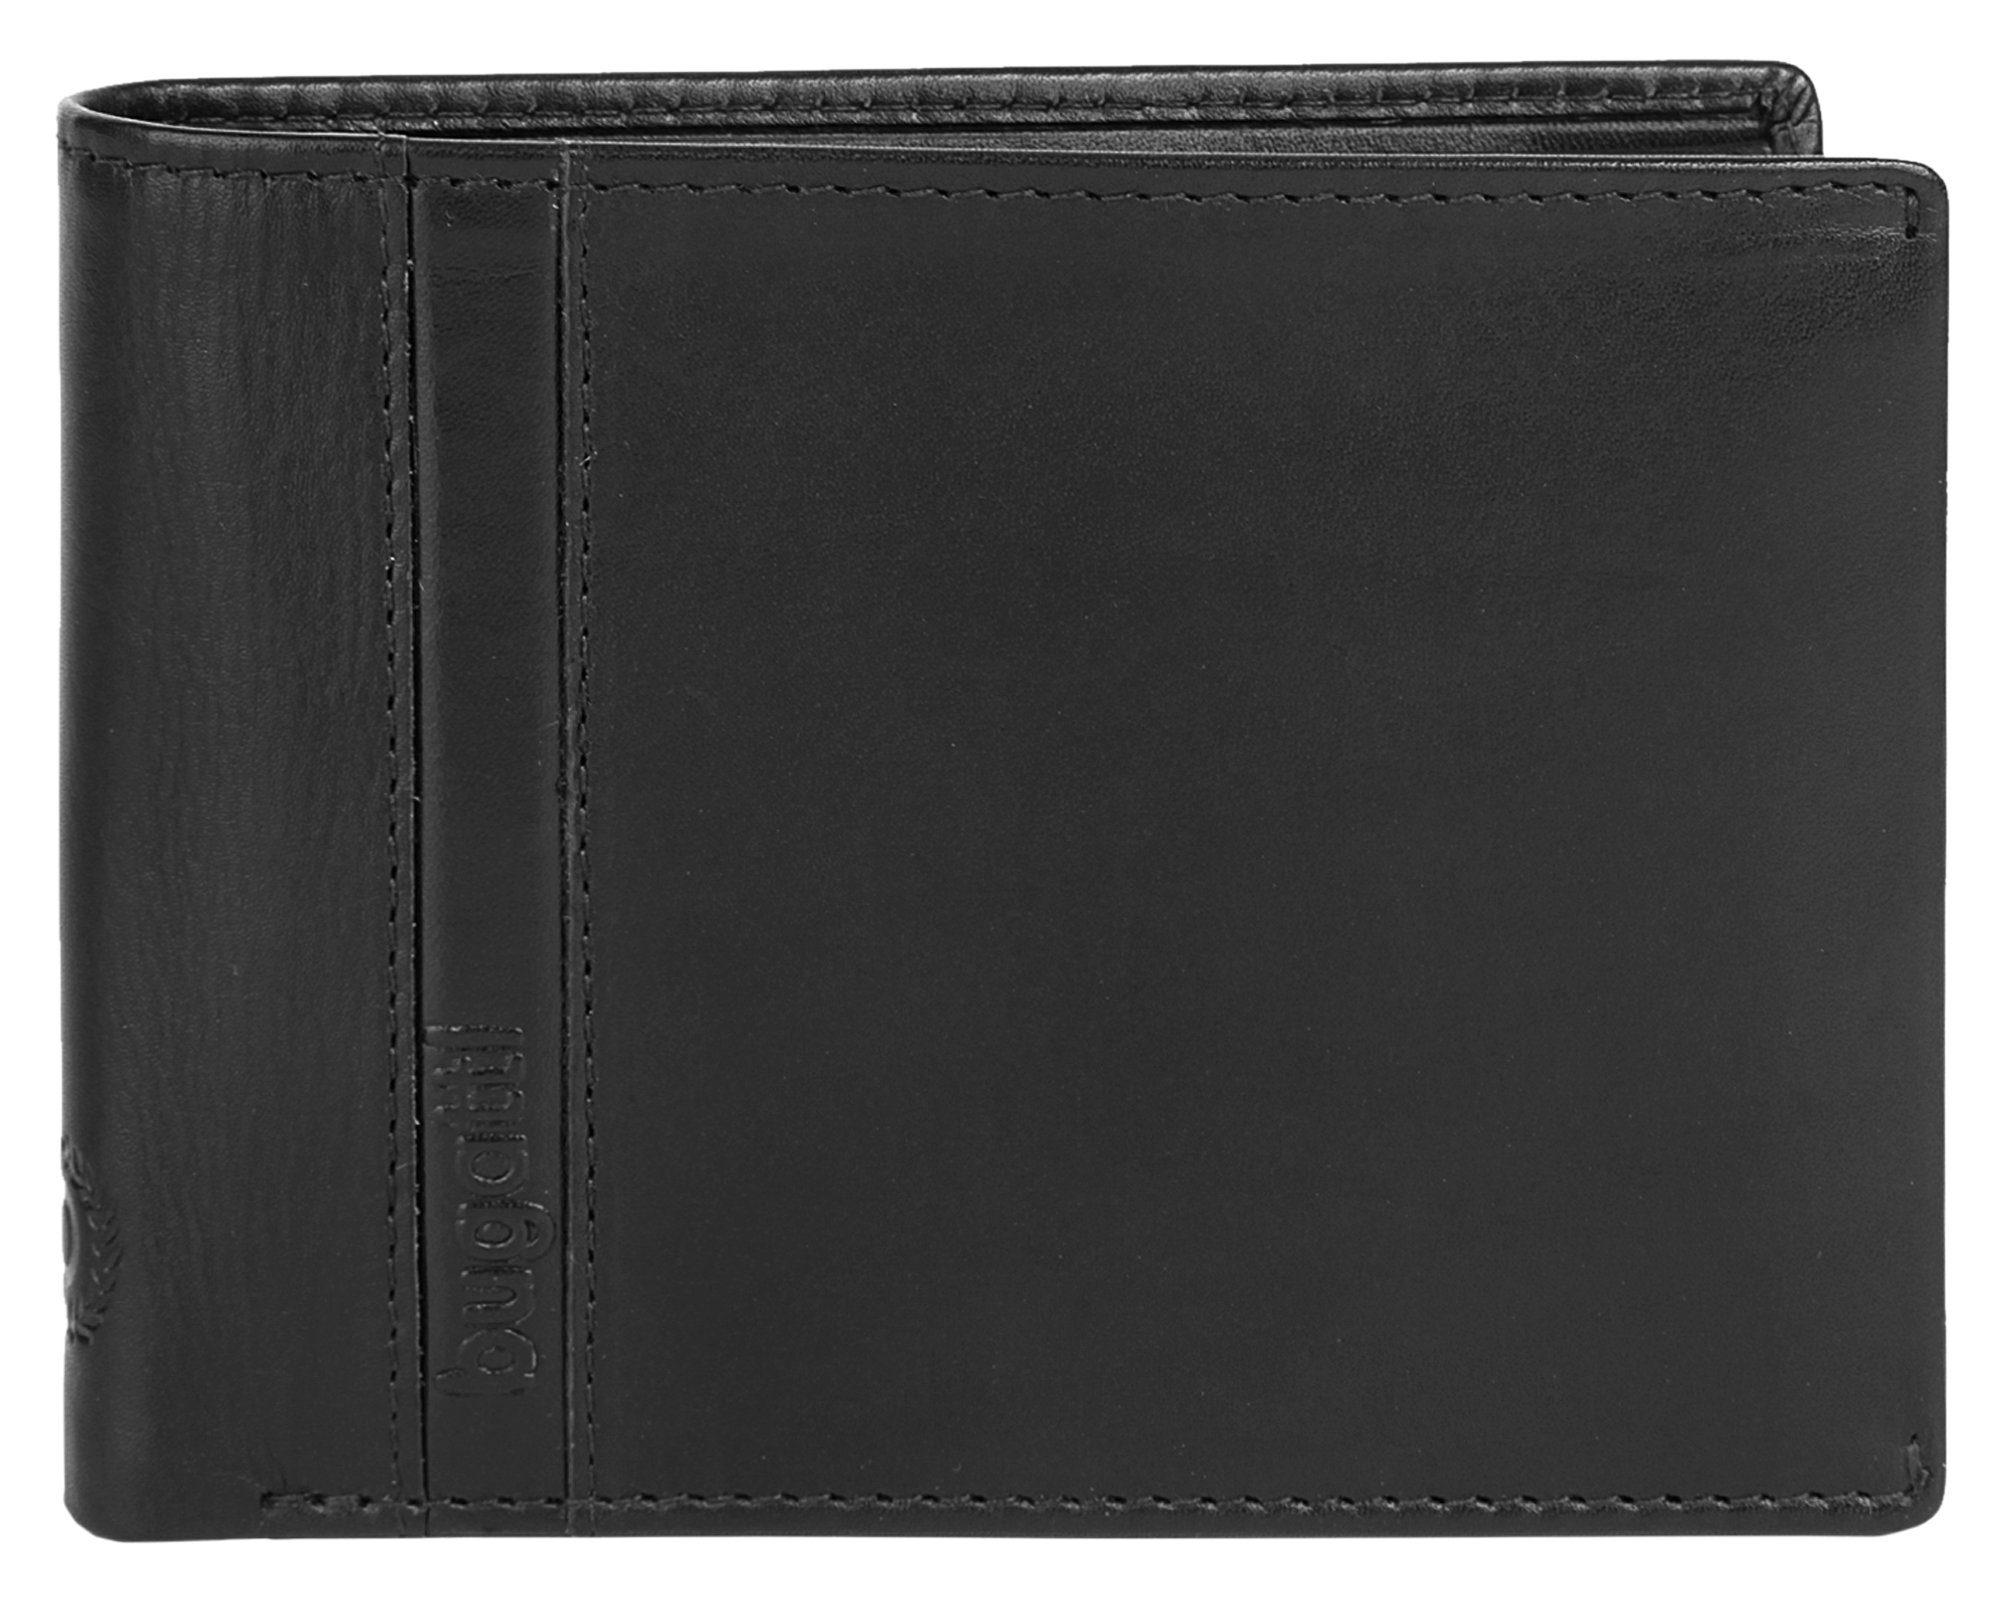 Bugatti Geldbörse »TRENTA«, Kreditkartenfächer